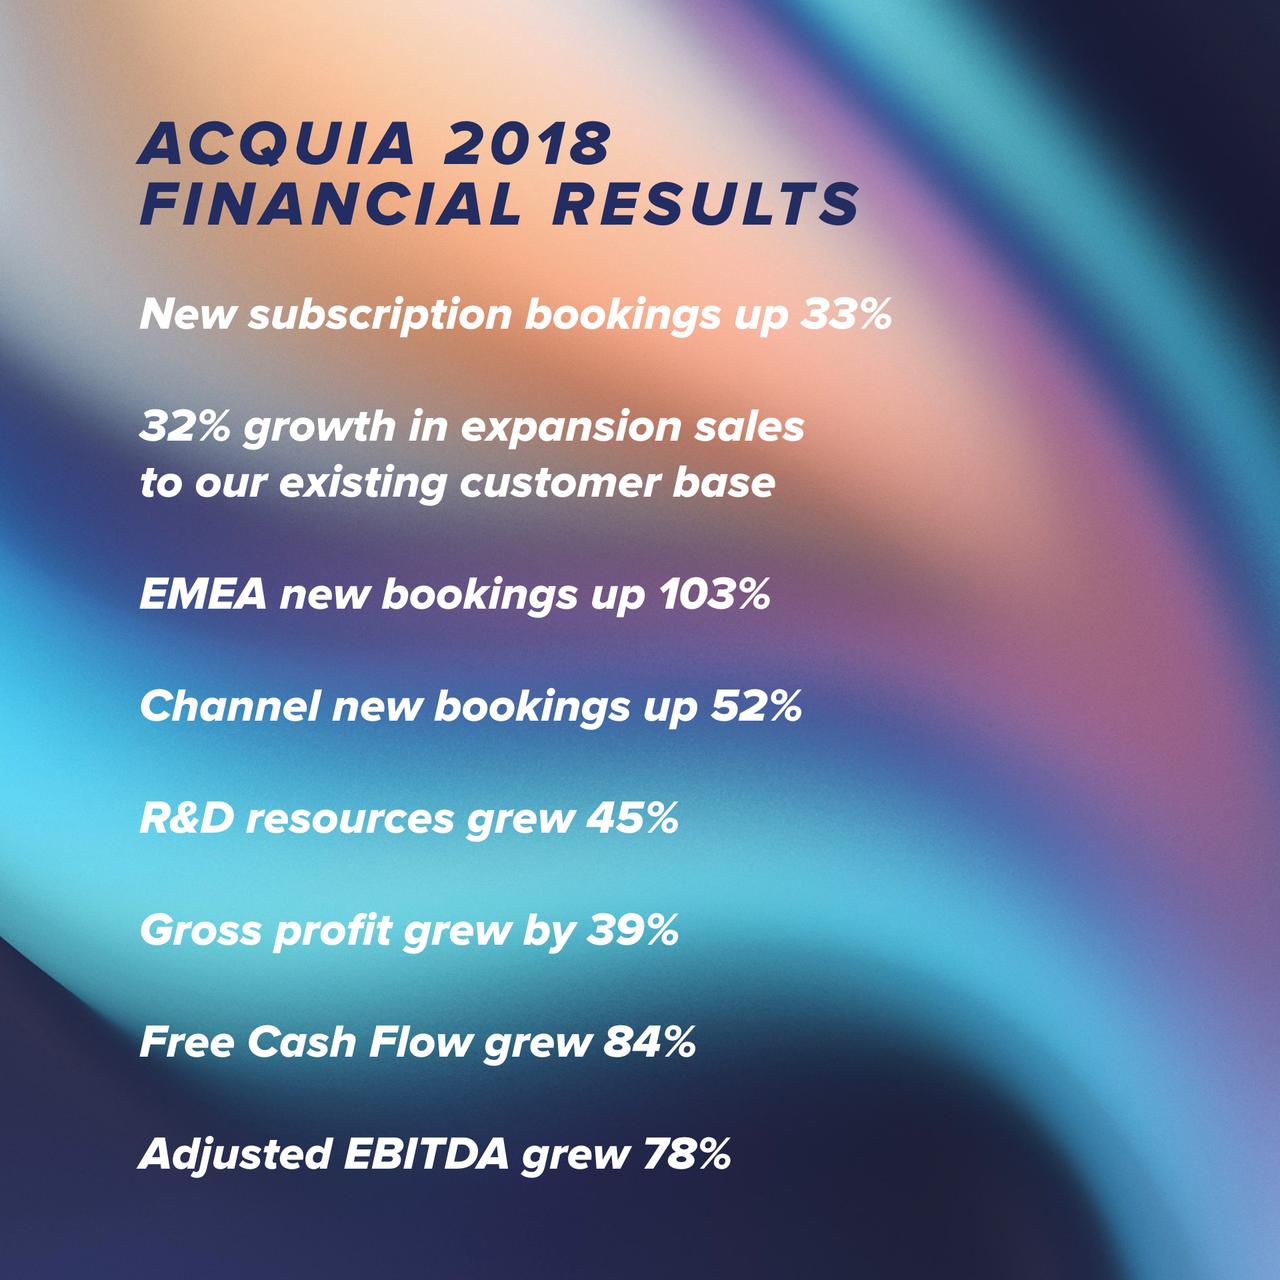 Acquia 2018 business metrics